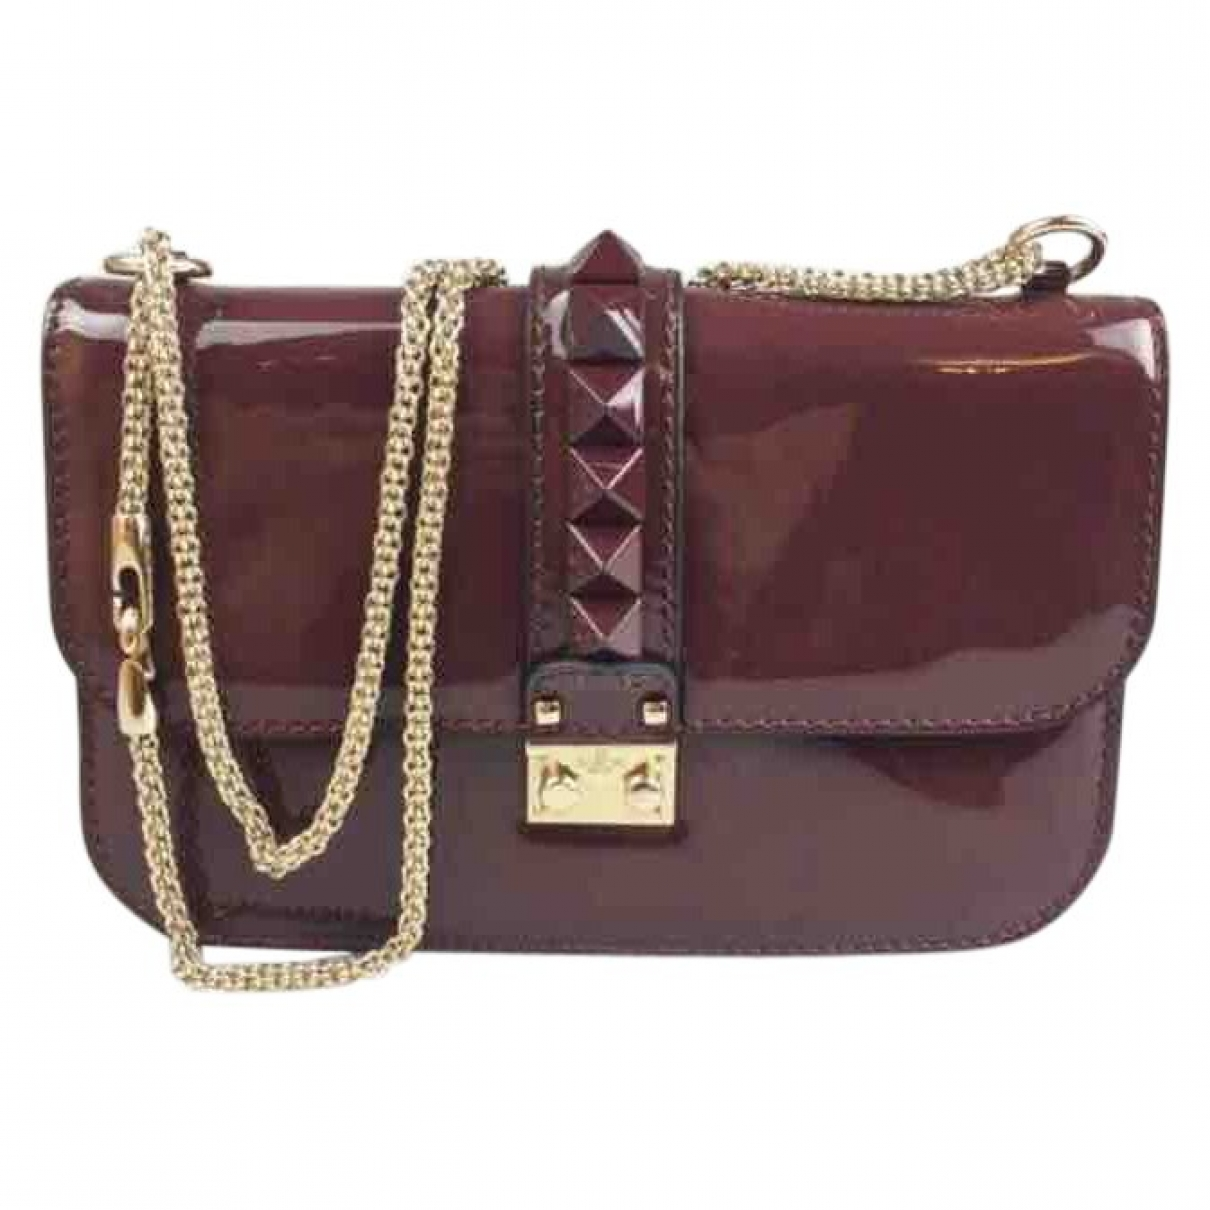 Valentino Garavani Glam Lock Patent leather handbag for Women \N